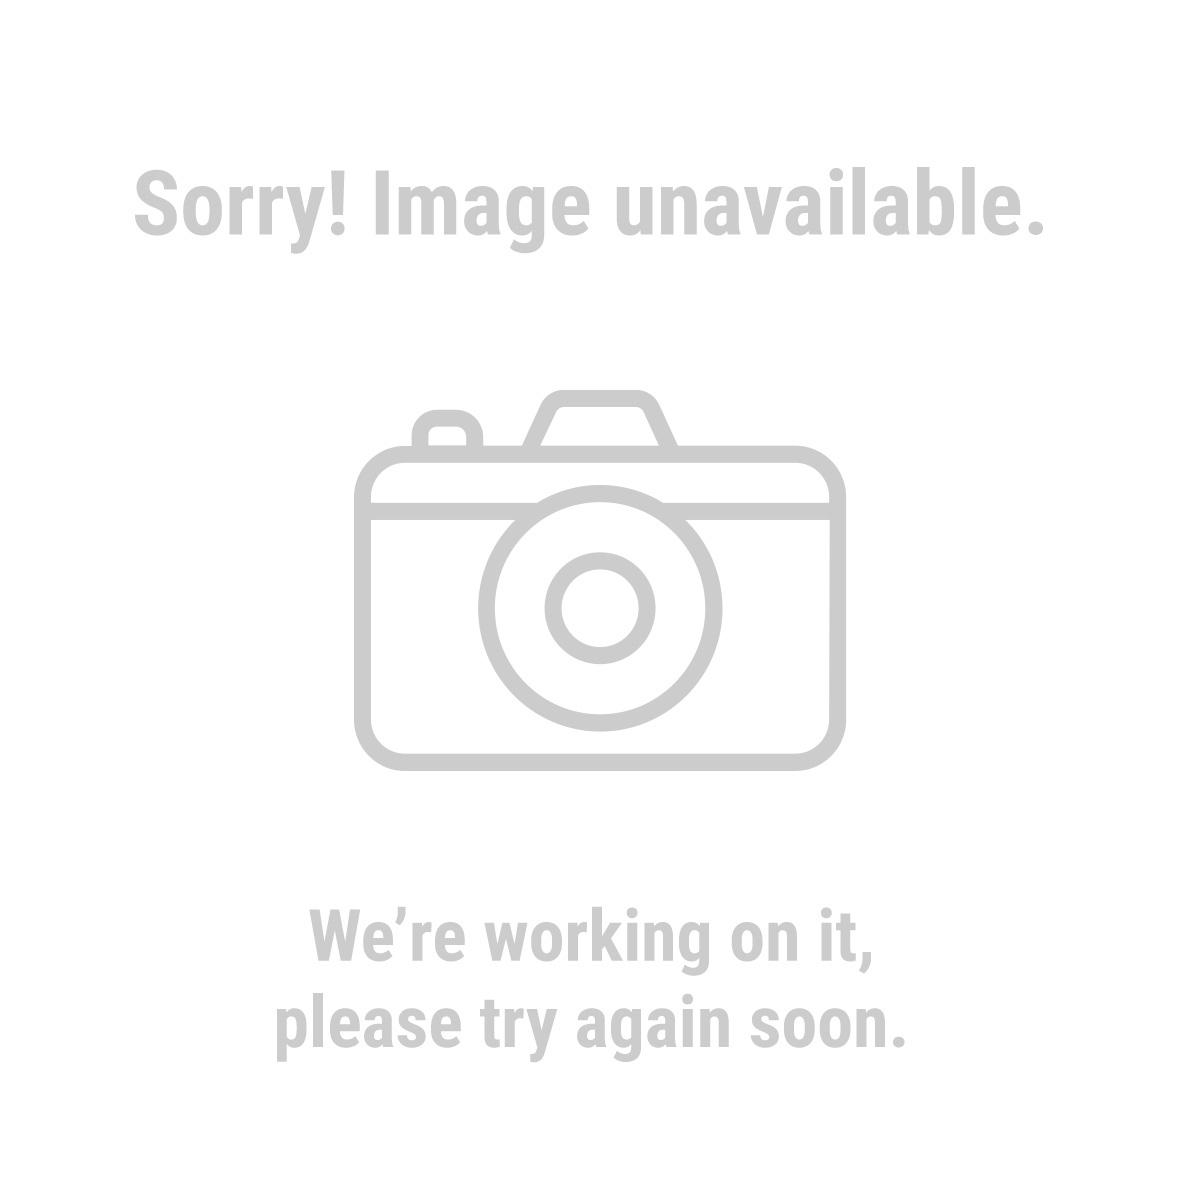 Haul-Master® 96406 2-1/4 Ton Trailer Stabilizer Jack